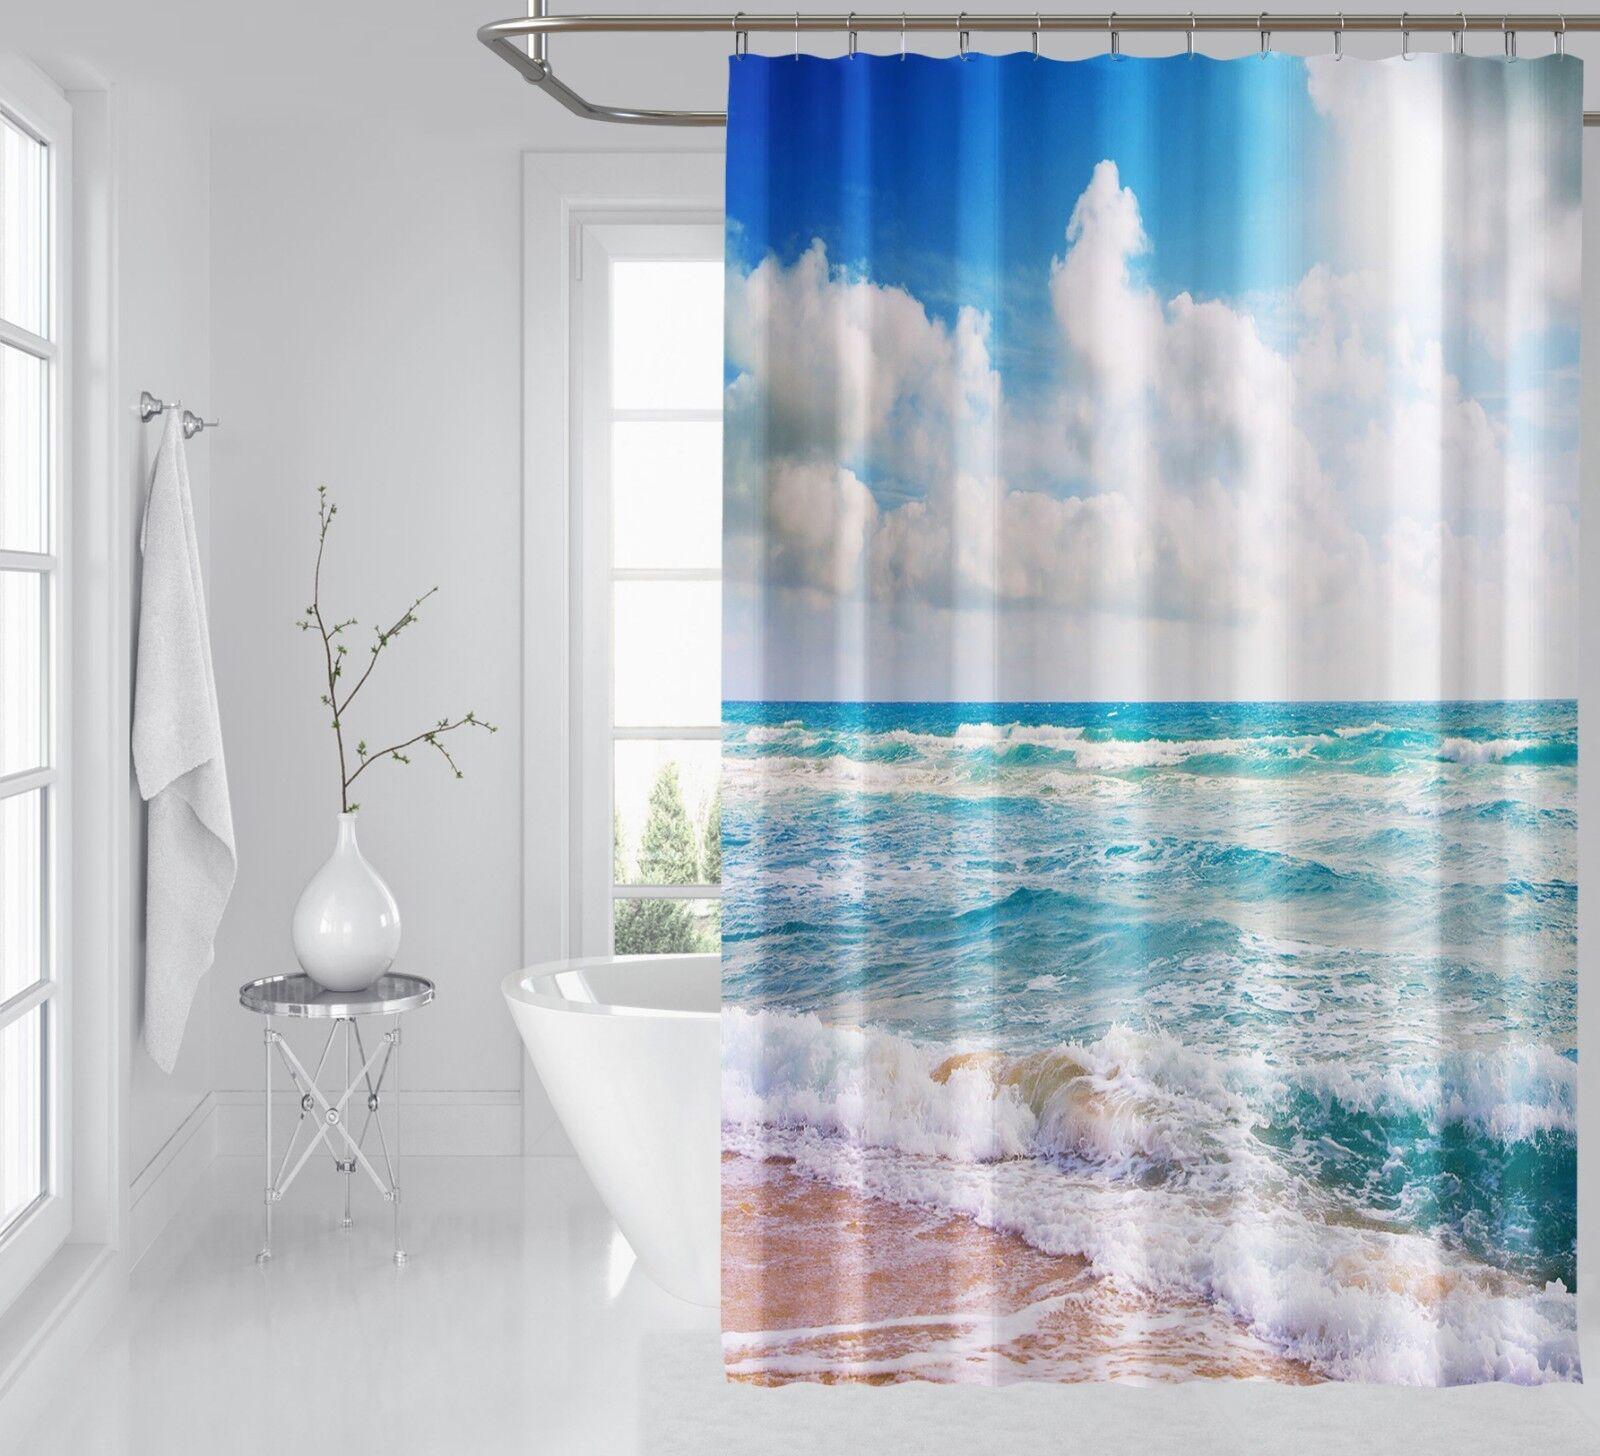 3D Beach Cloud 5 Shower Curtain Waterproof Fiber Bathroom Home Windows Toilet